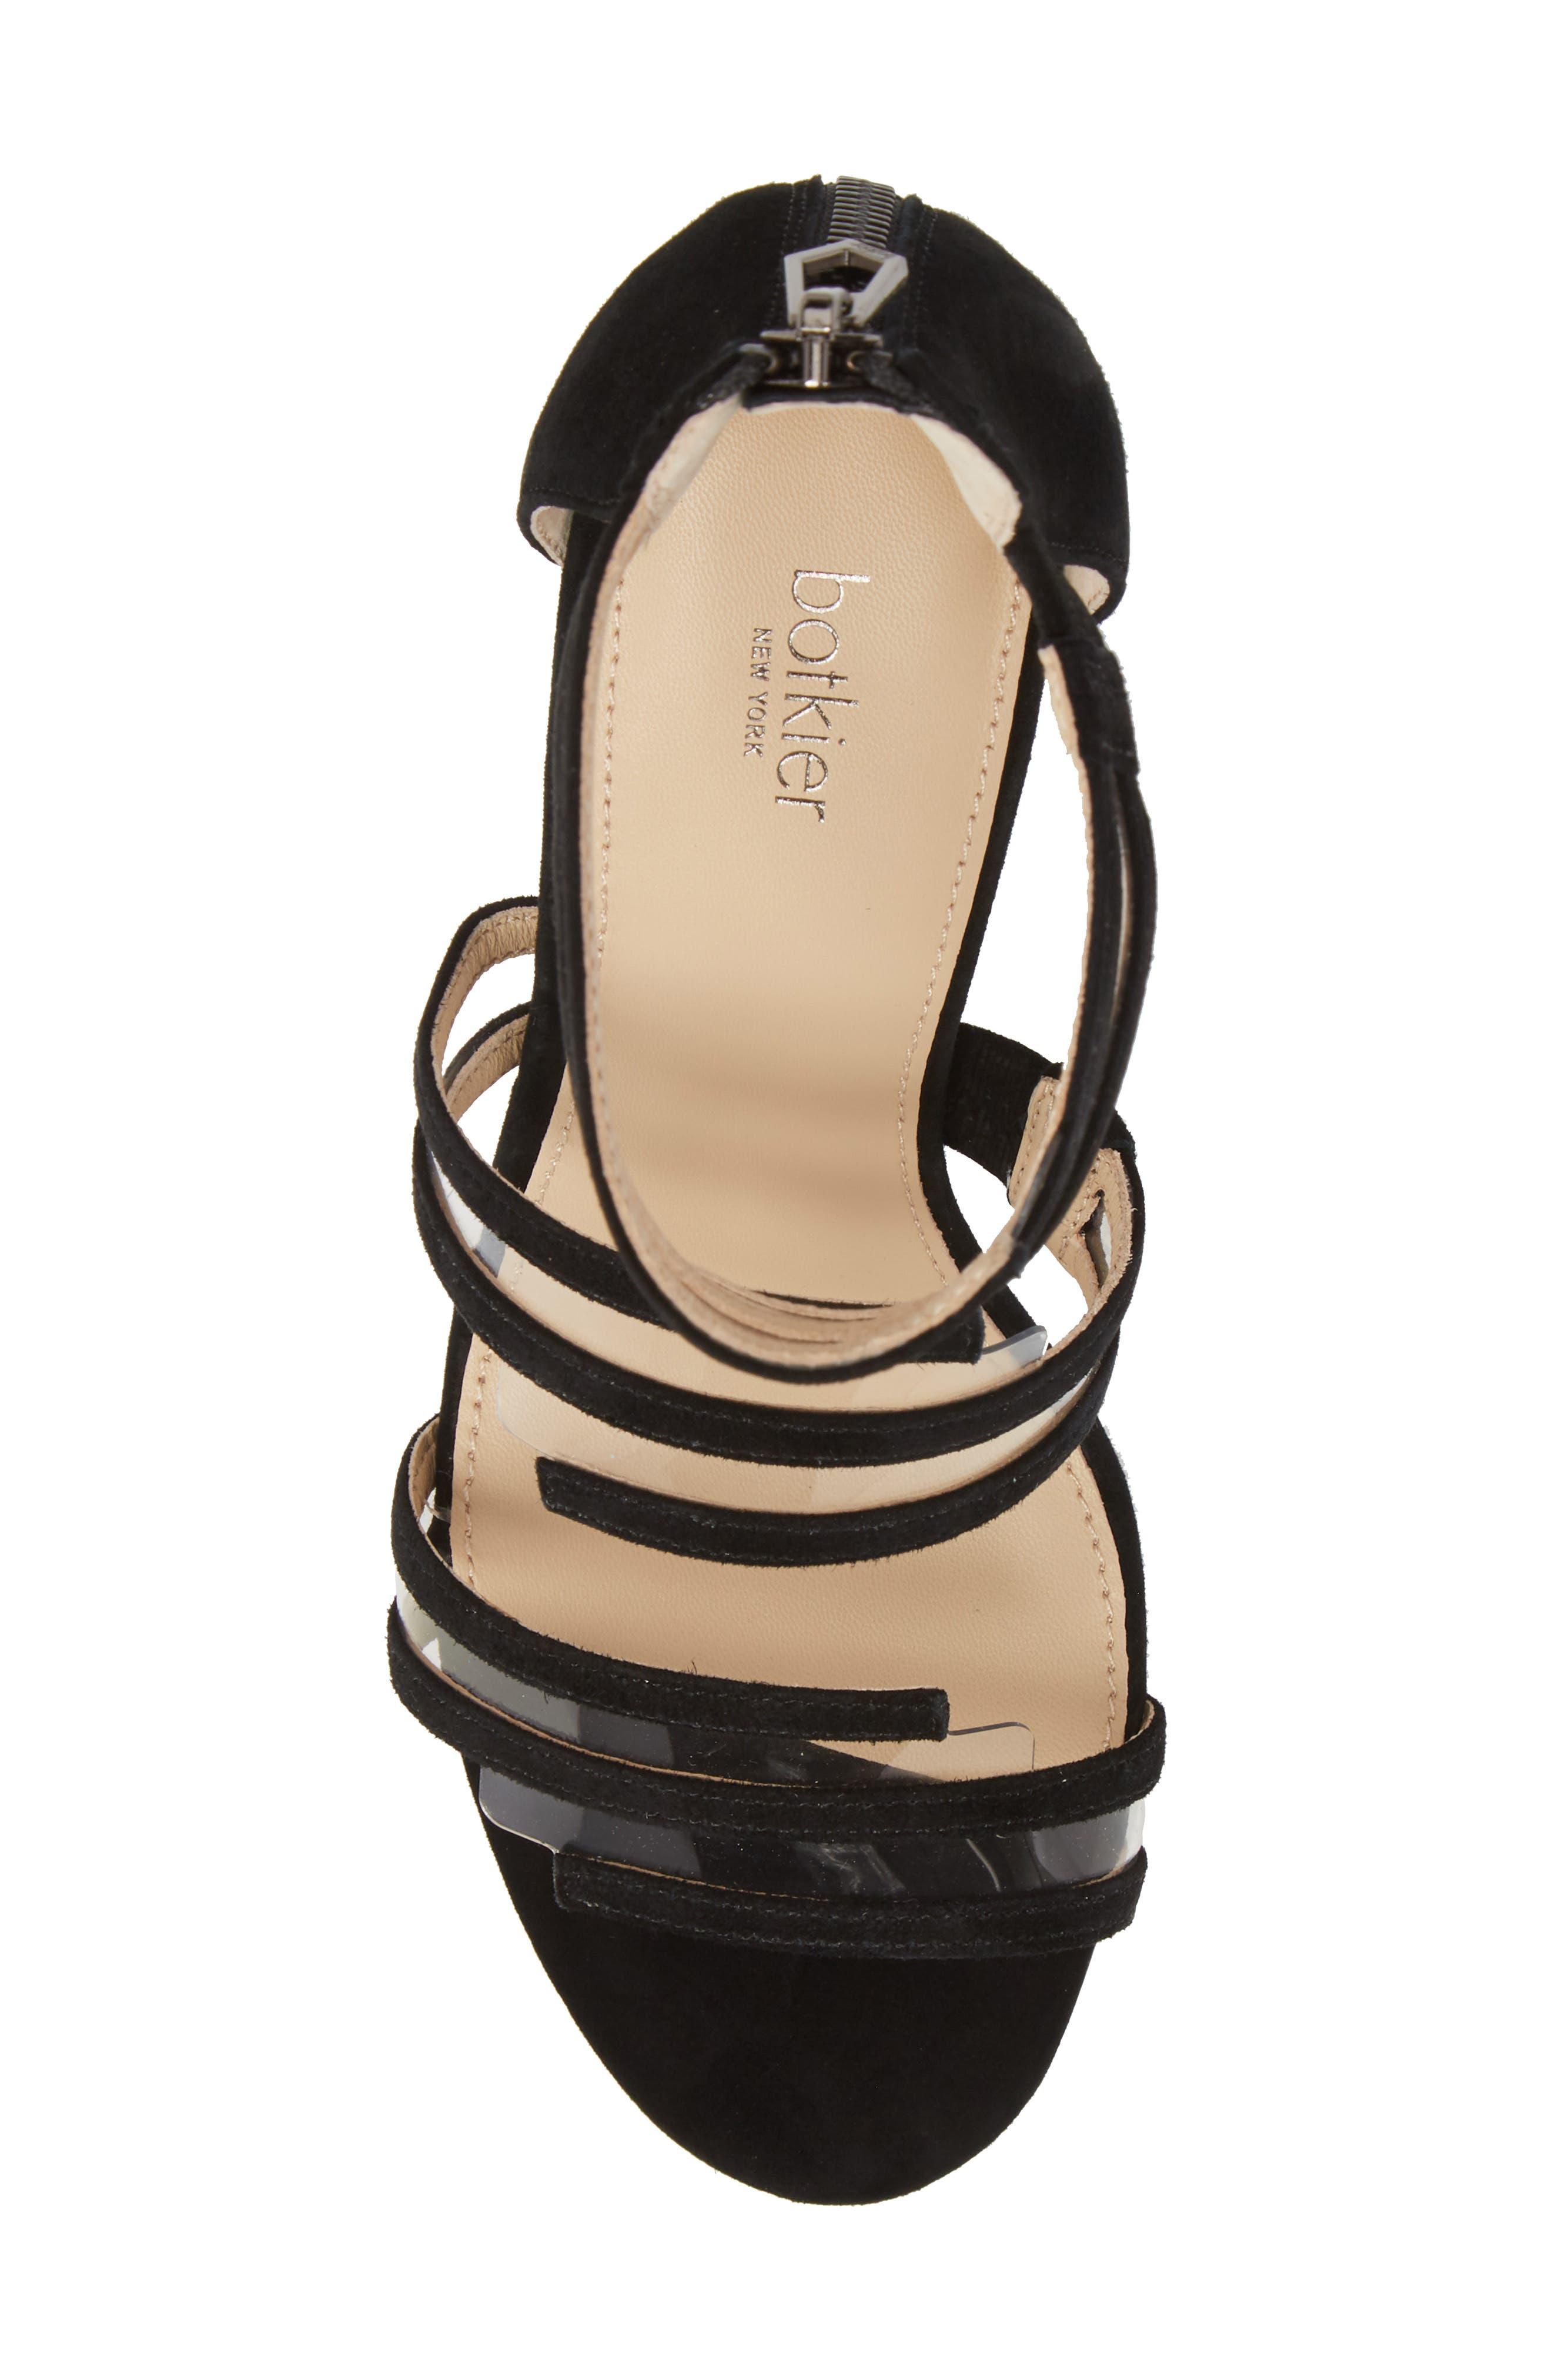 Grecia Sandal,                             Alternate thumbnail 5, color,                             BLACK SUEDE